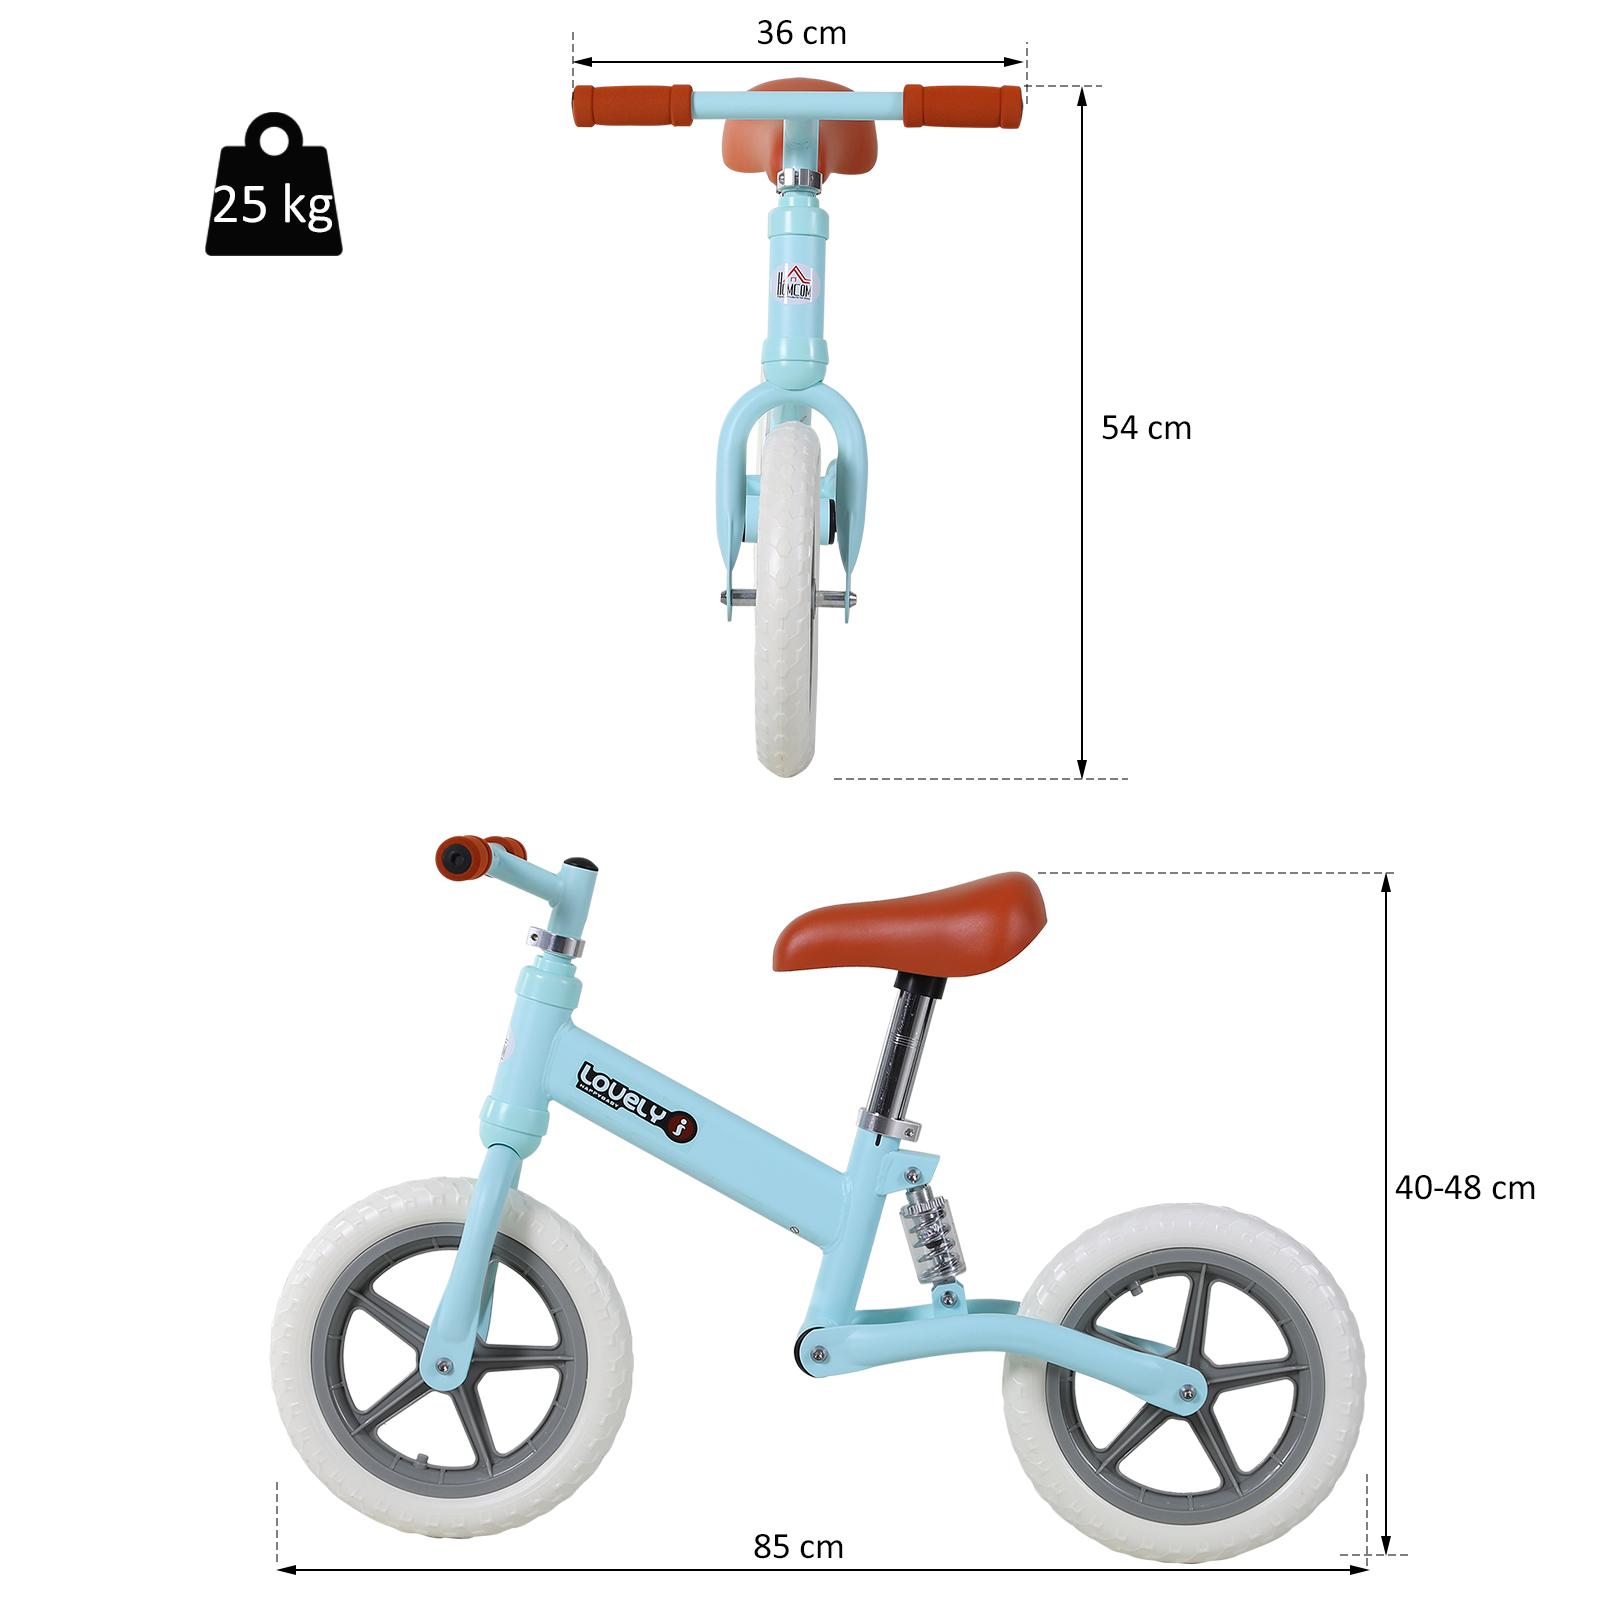 Indexbild 13 - HOMCOM Laufrad mit Stoßdämpfer Kinderrad Lauflernrad Balance Bike 2-5 Jahre